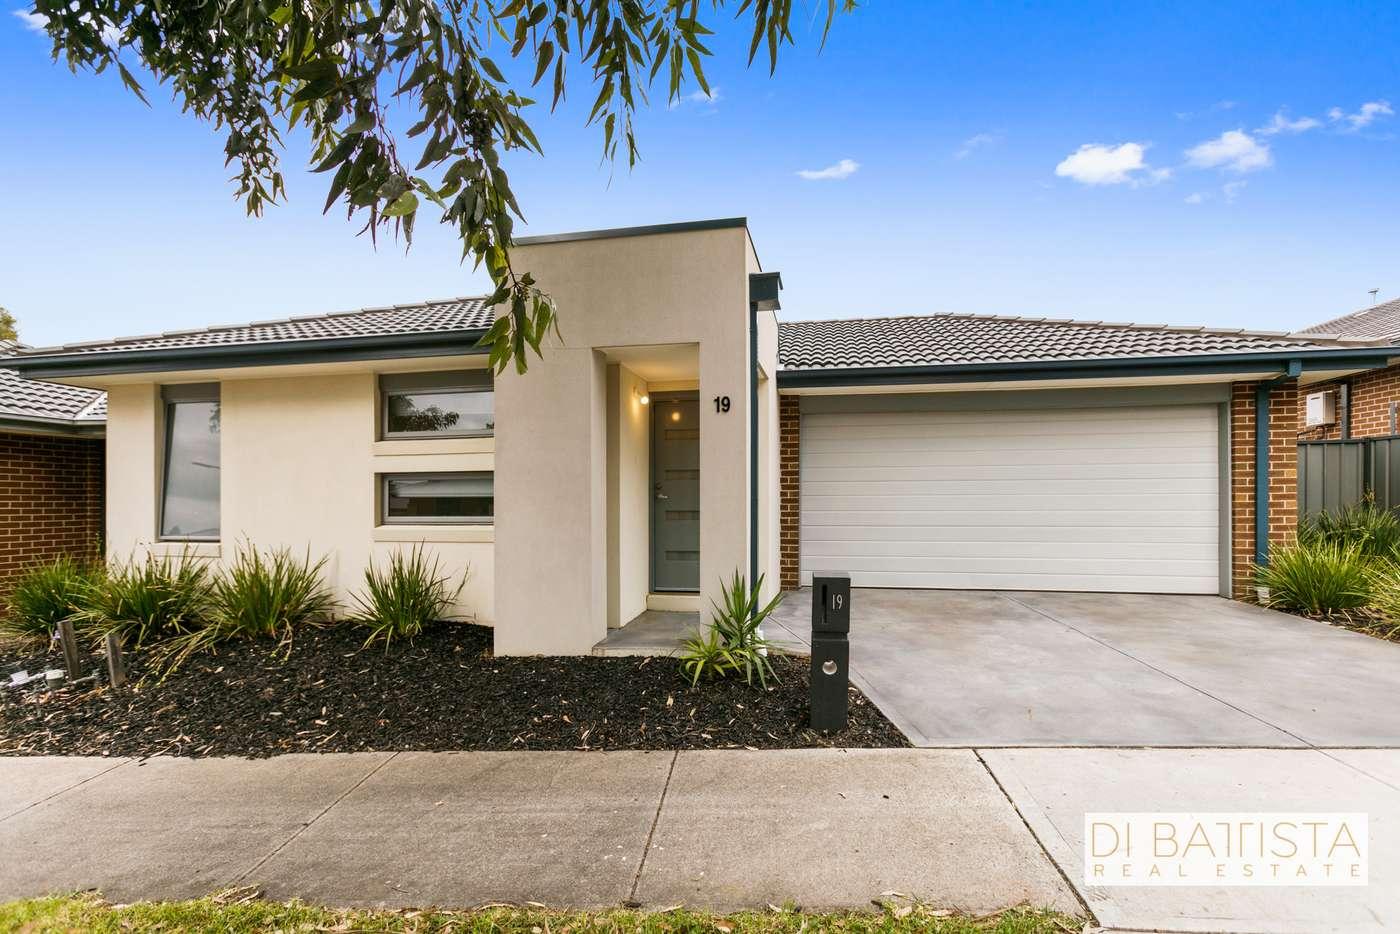 Main view of Homely house listing, 19 Versant Drive, Craigieburn VIC 3064